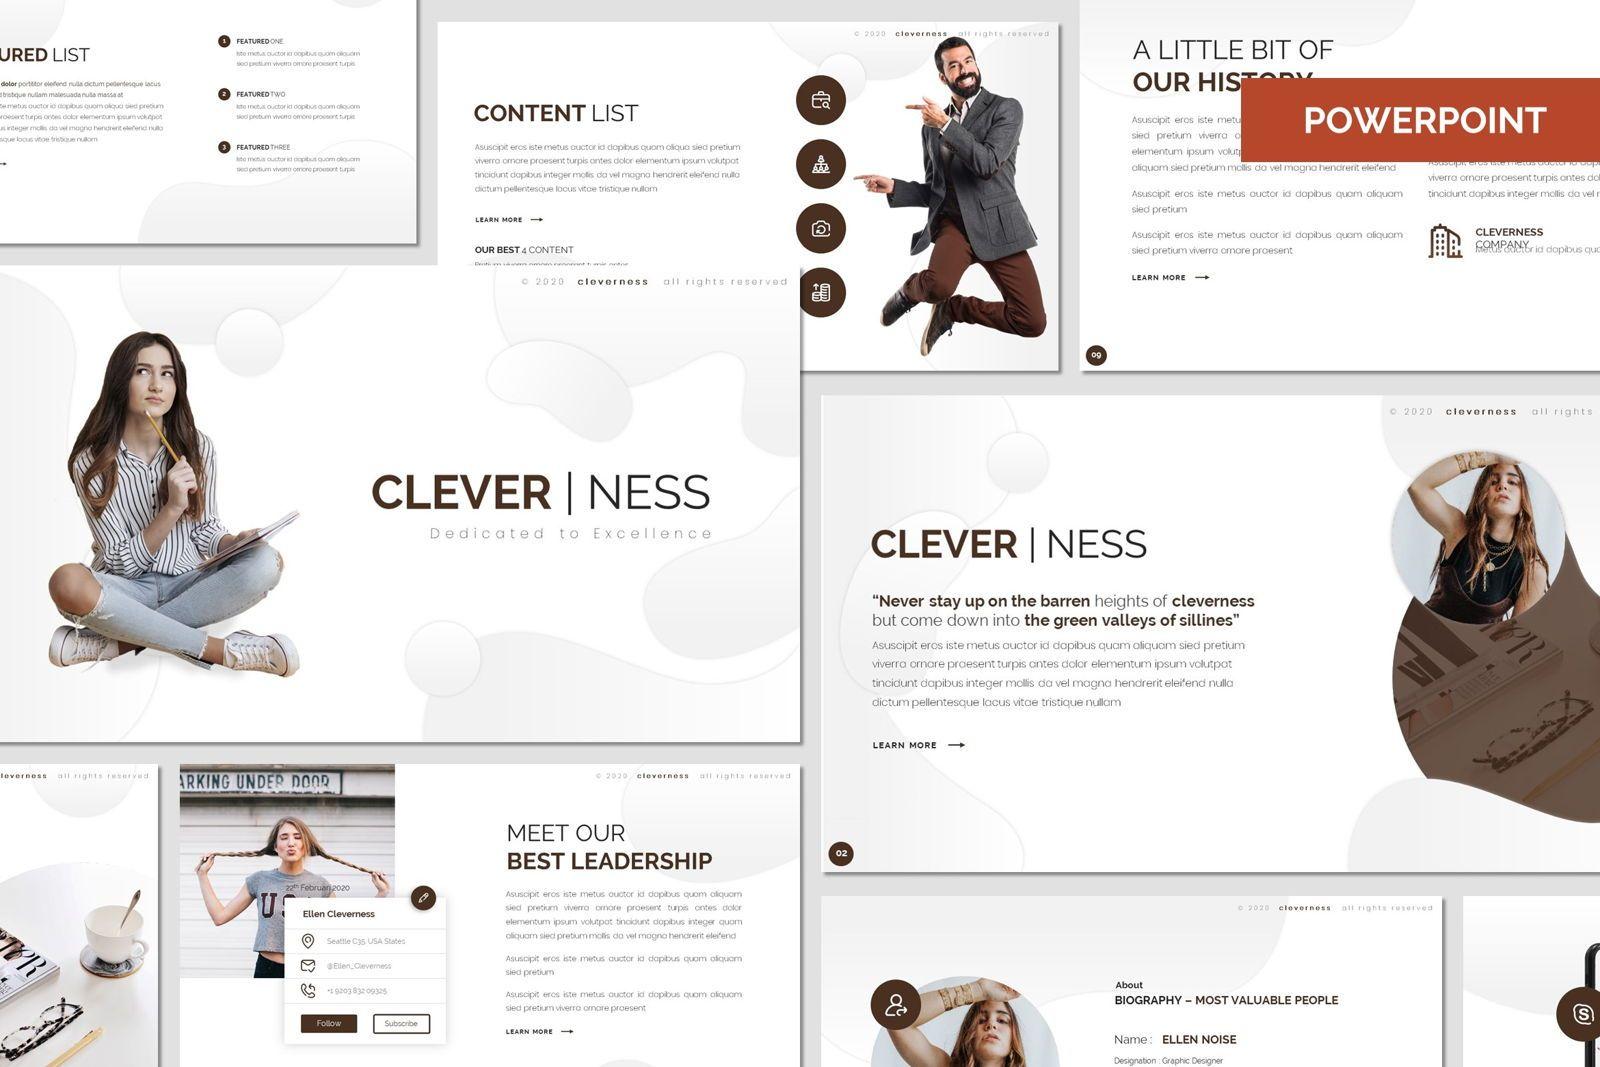 Clevernes - Powerpoint Template, 07761, Presentation Templates — PoweredTemplate.com